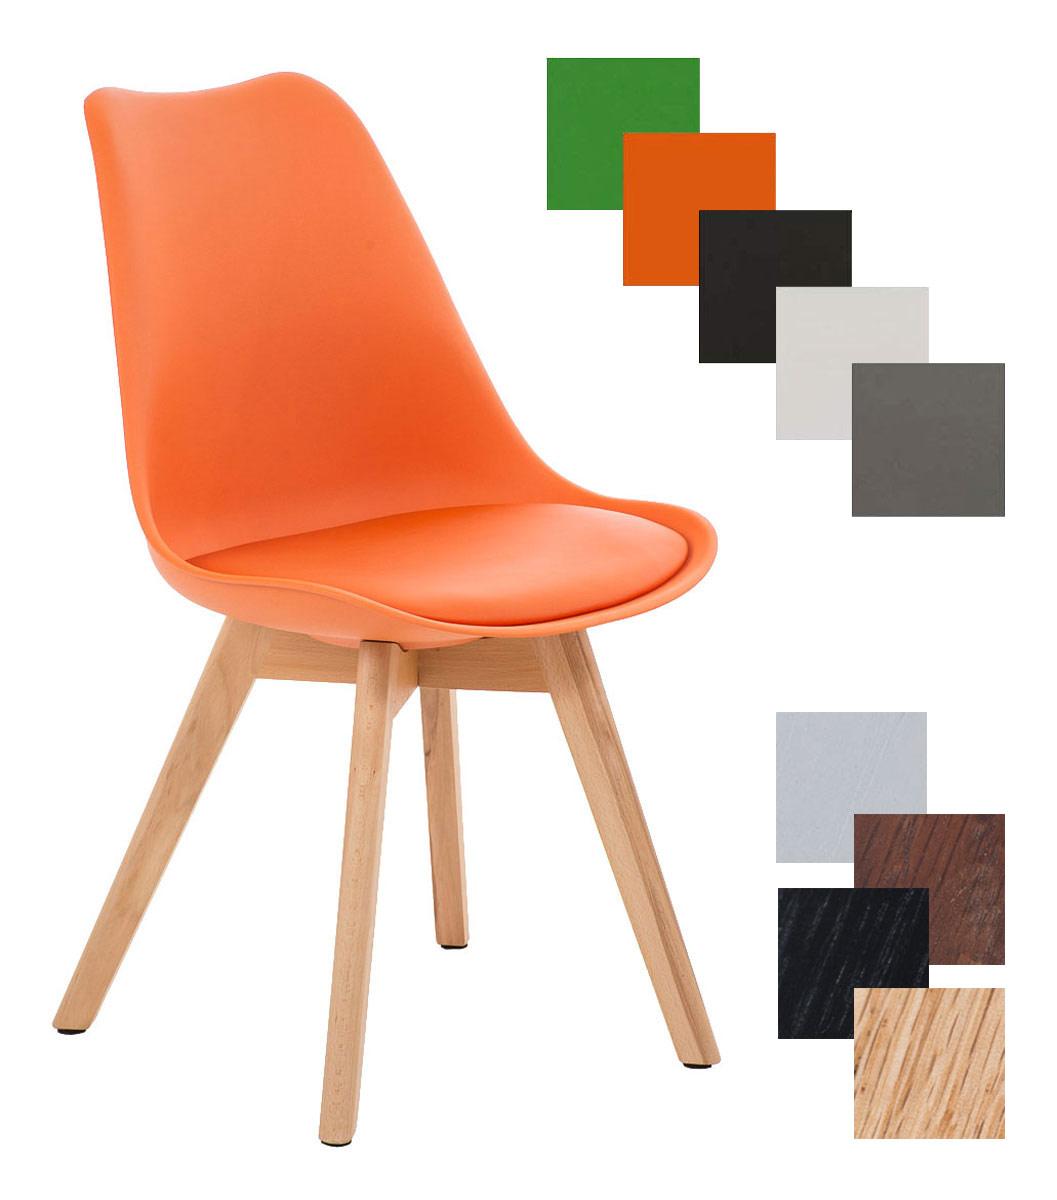 chaise salle manger scandinave borneo assise similicuir dossier plastique ebay. Black Bedroom Furniture Sets. Home Design Ideas